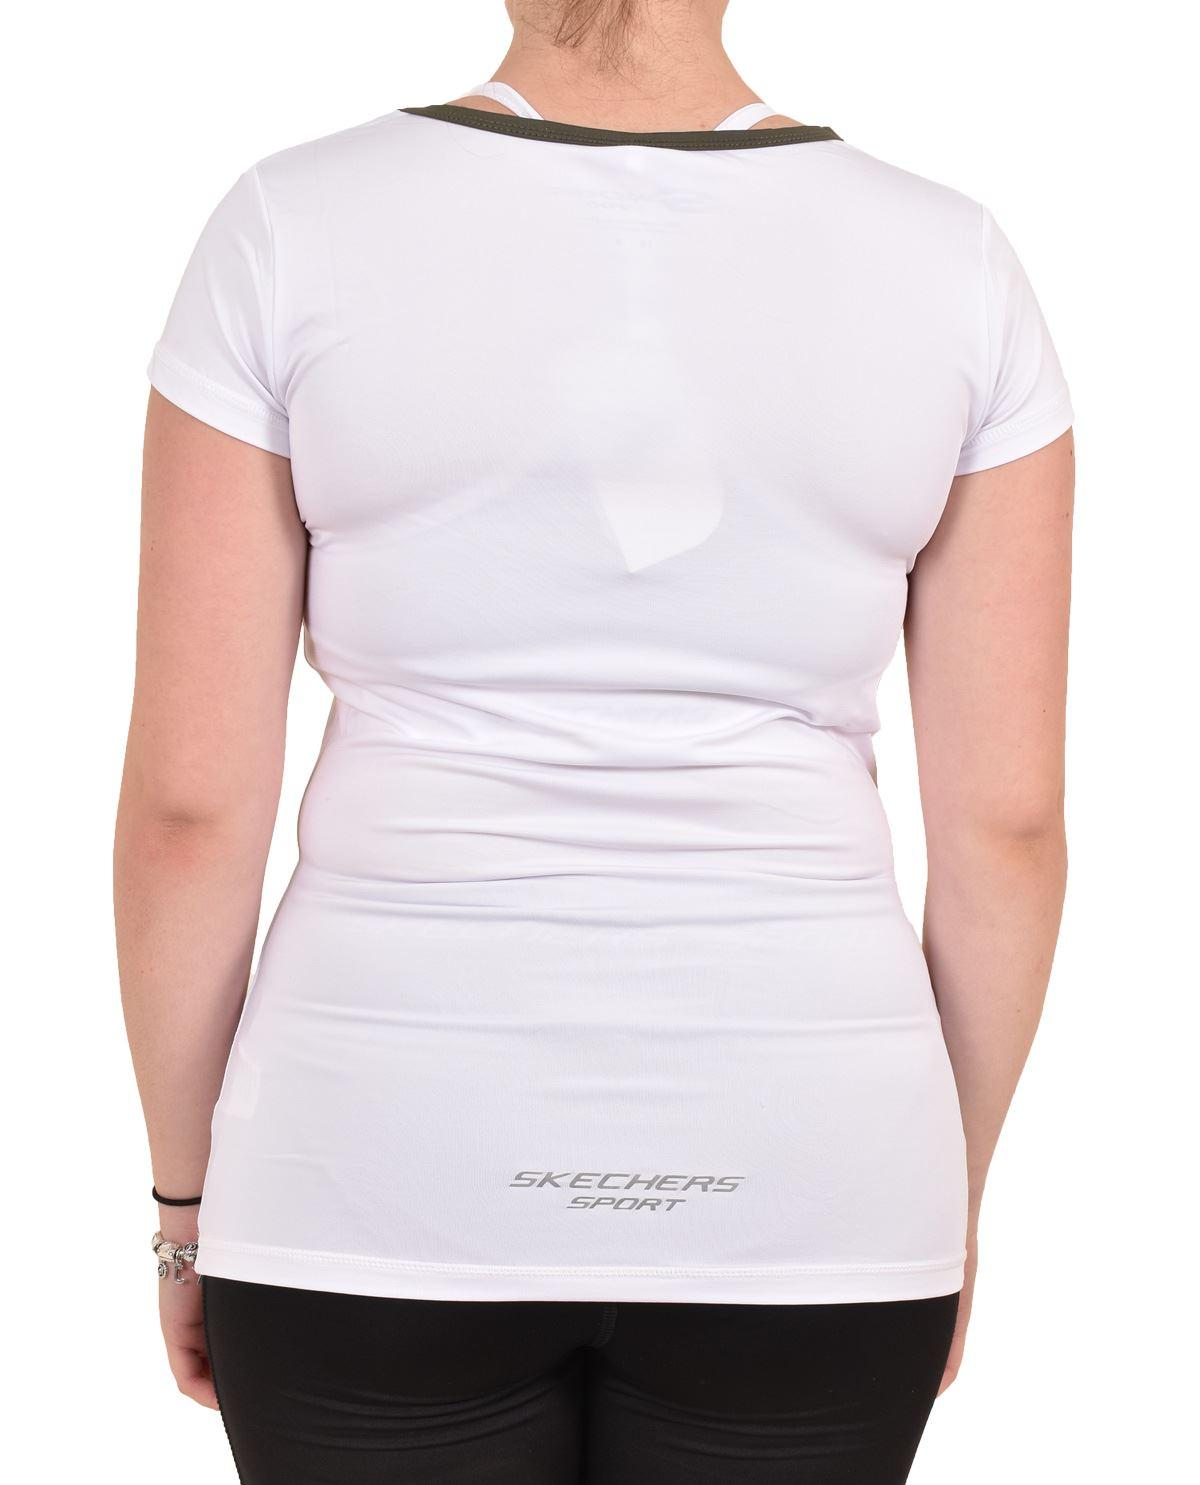 Camiseta-para-mujer-Skechers-Secado-Rapido-Top-senoras-de-Deportes-Activewear-Gimnasio-Fitness-Dance miniatura 13